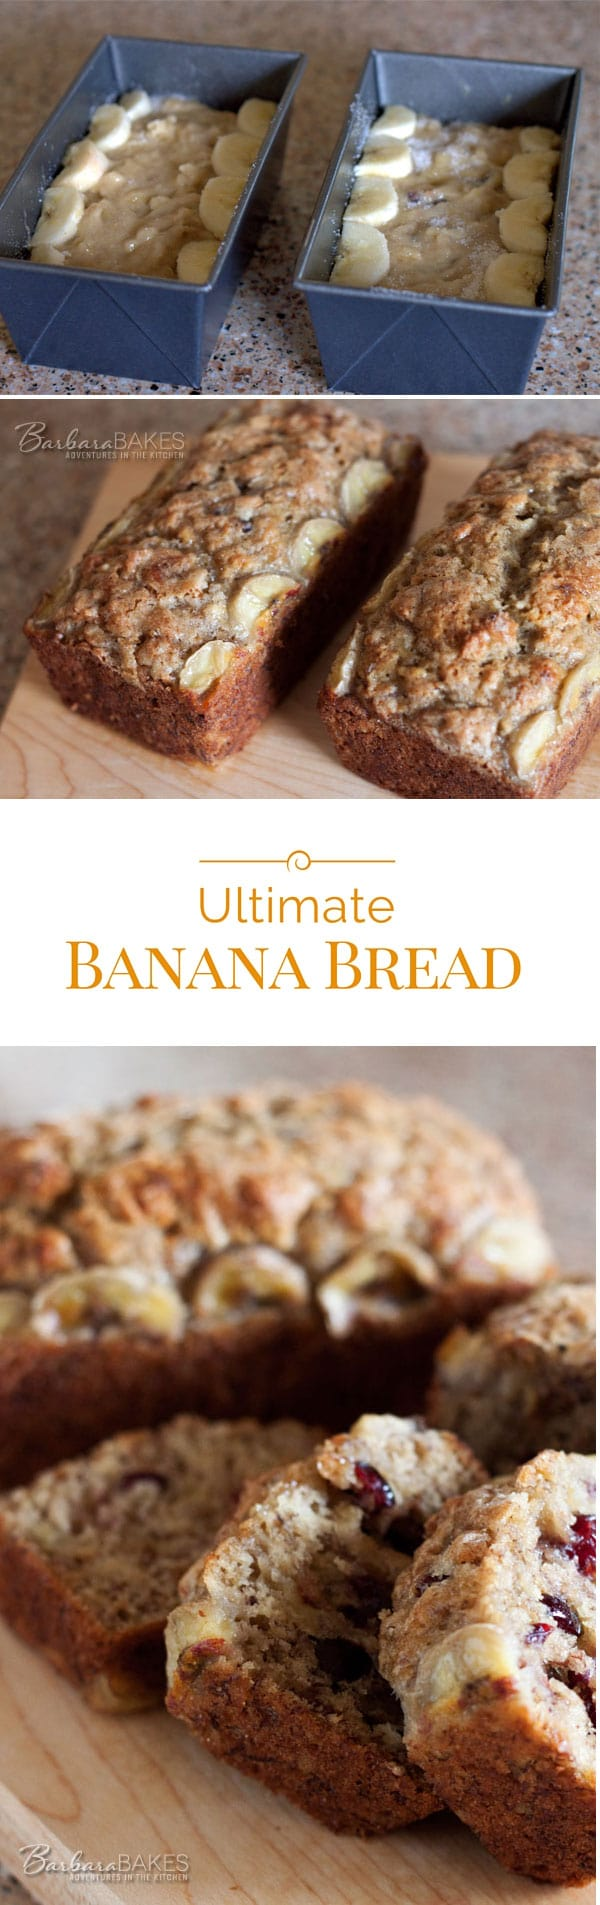 Ultimate-Banana-Bread-Collage-Barbara-Bakes